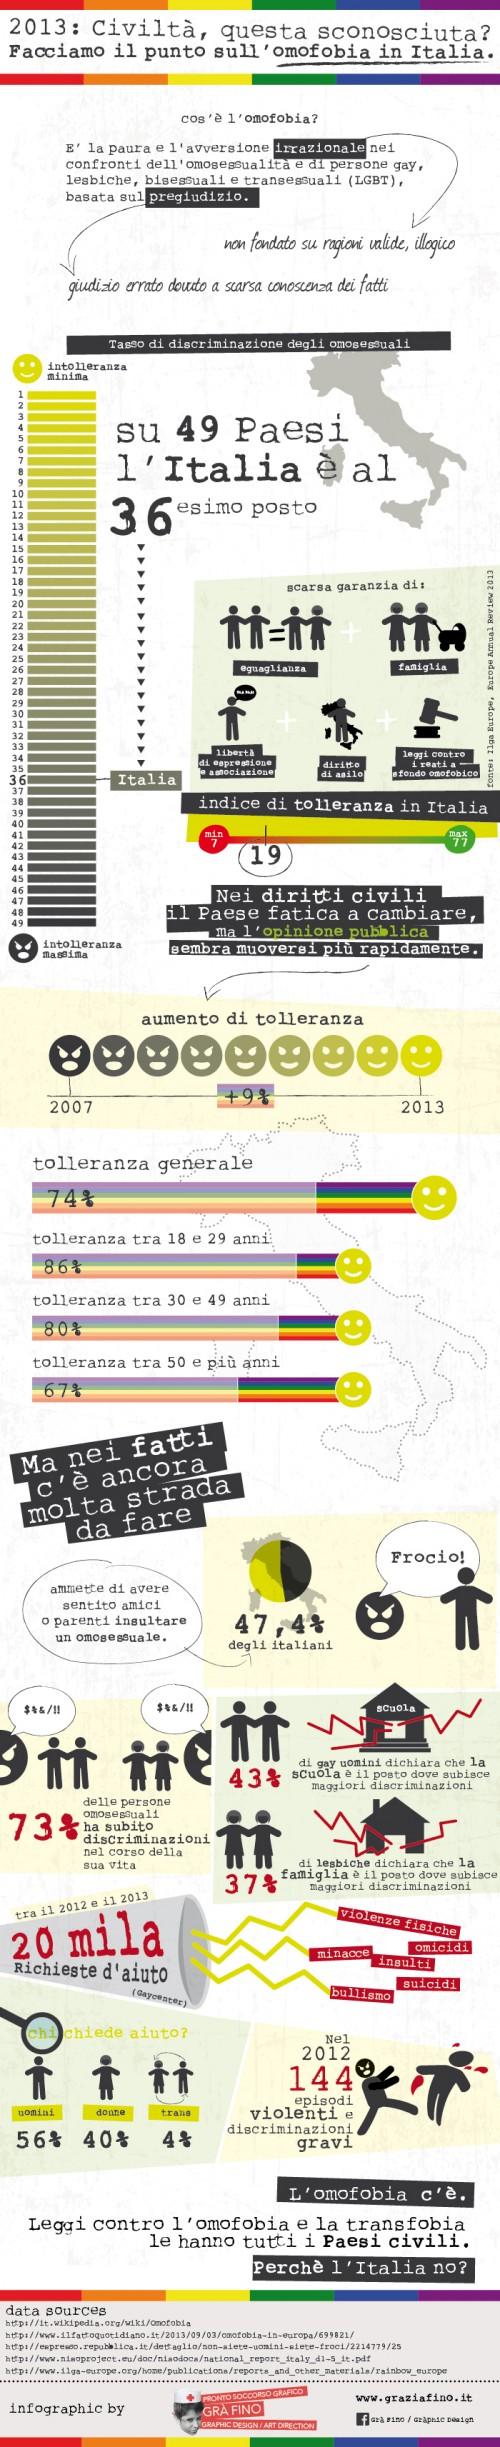 Infografica-Omofobia-01